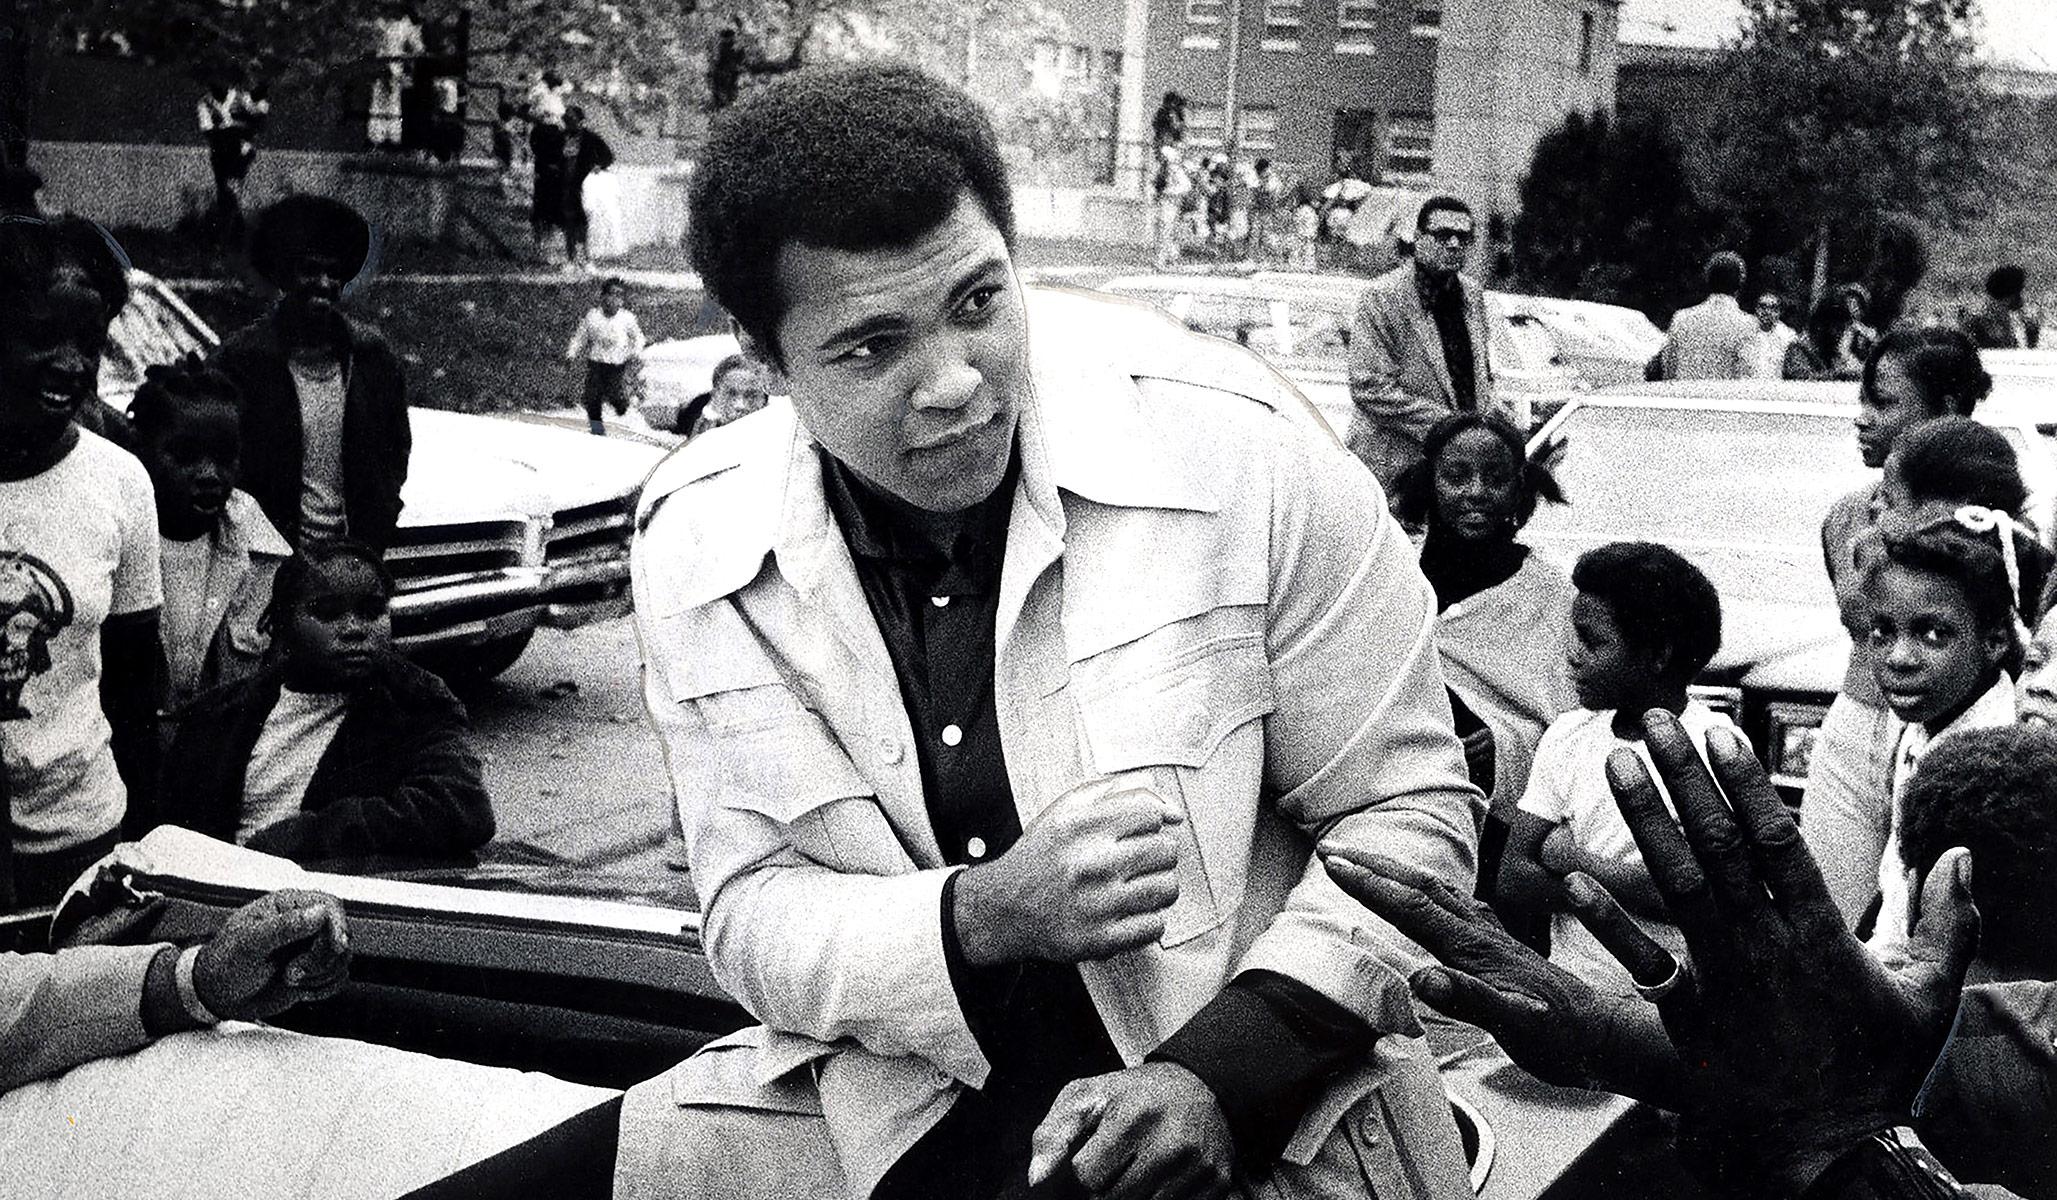 The Tragic Hero of American Sports: Muhammad Ali in All His Glory